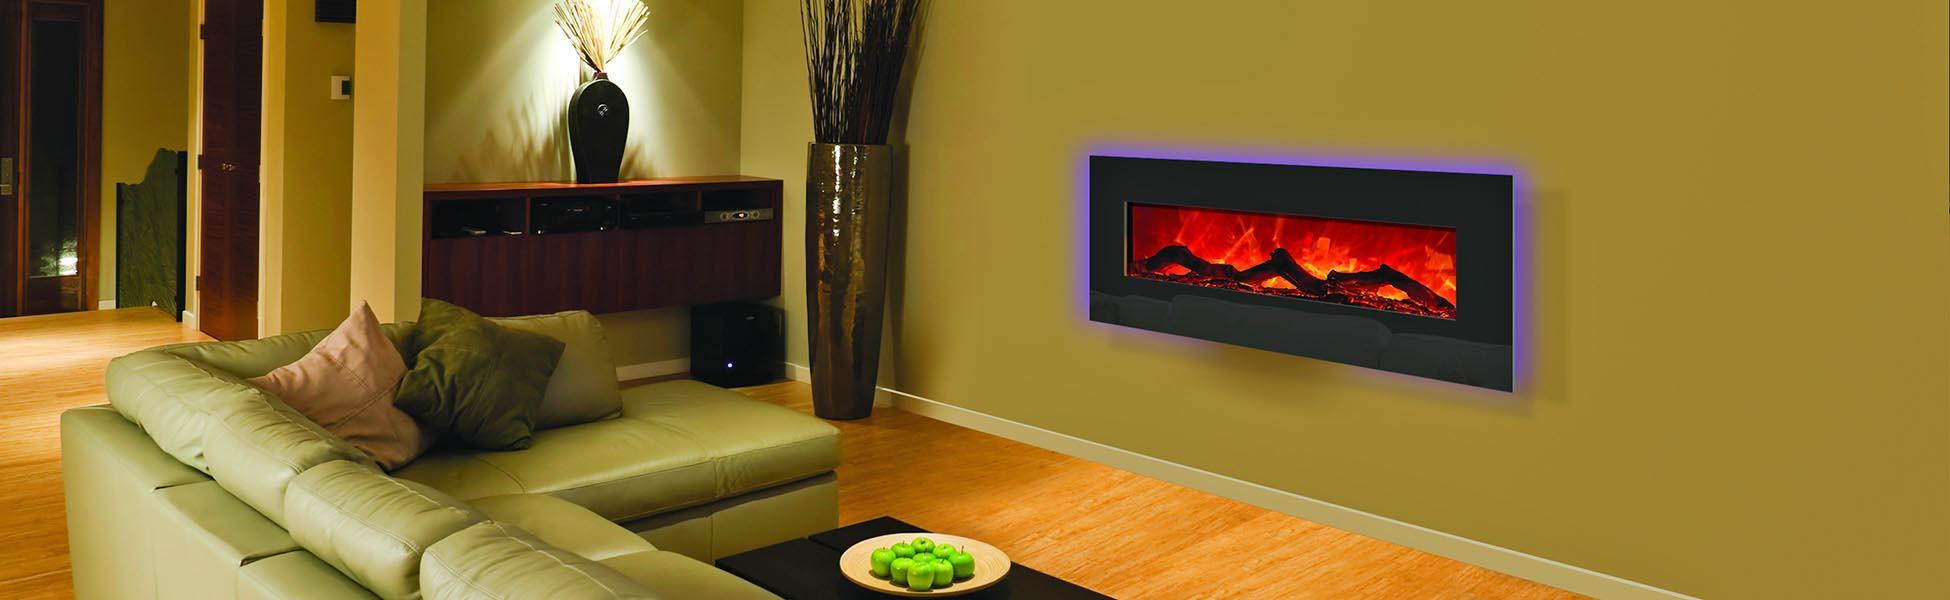 WM-BI-48-5823 electric fireplace